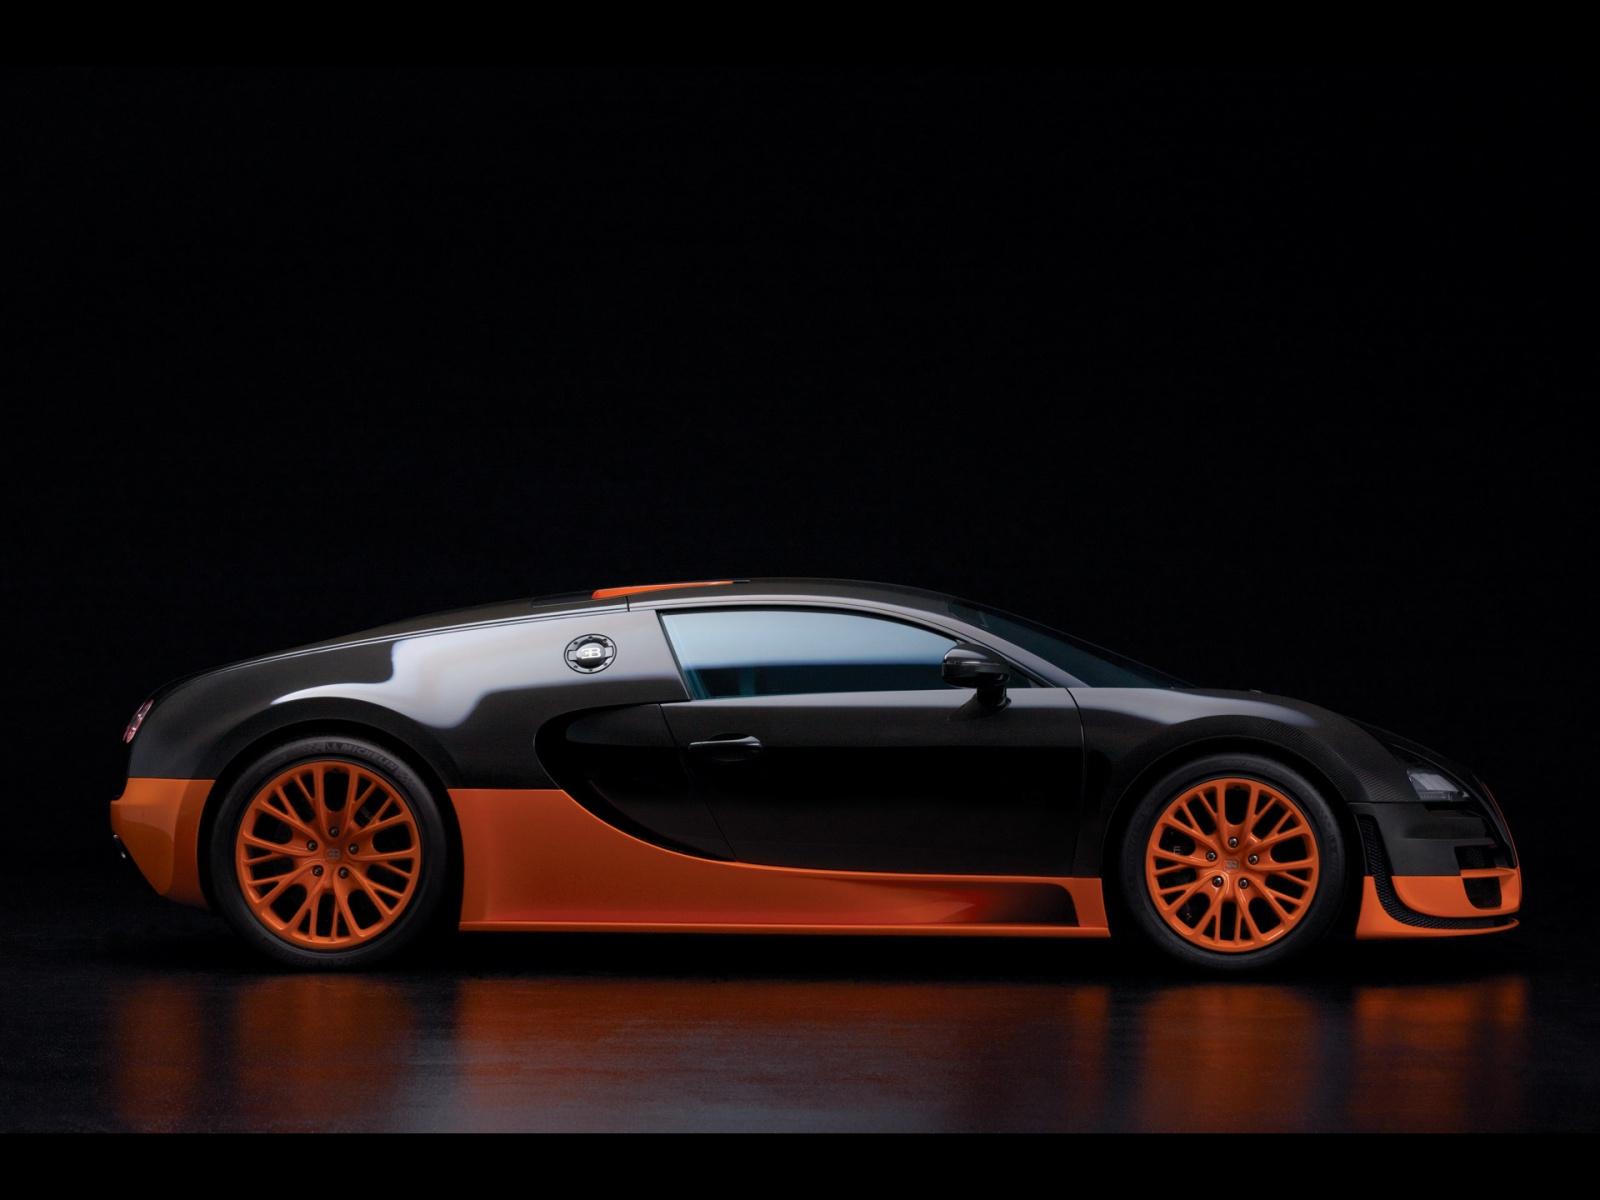 Carbon Hd Bugatti Veyron Supersport Fibre 286409 Wallpaper wallpaper